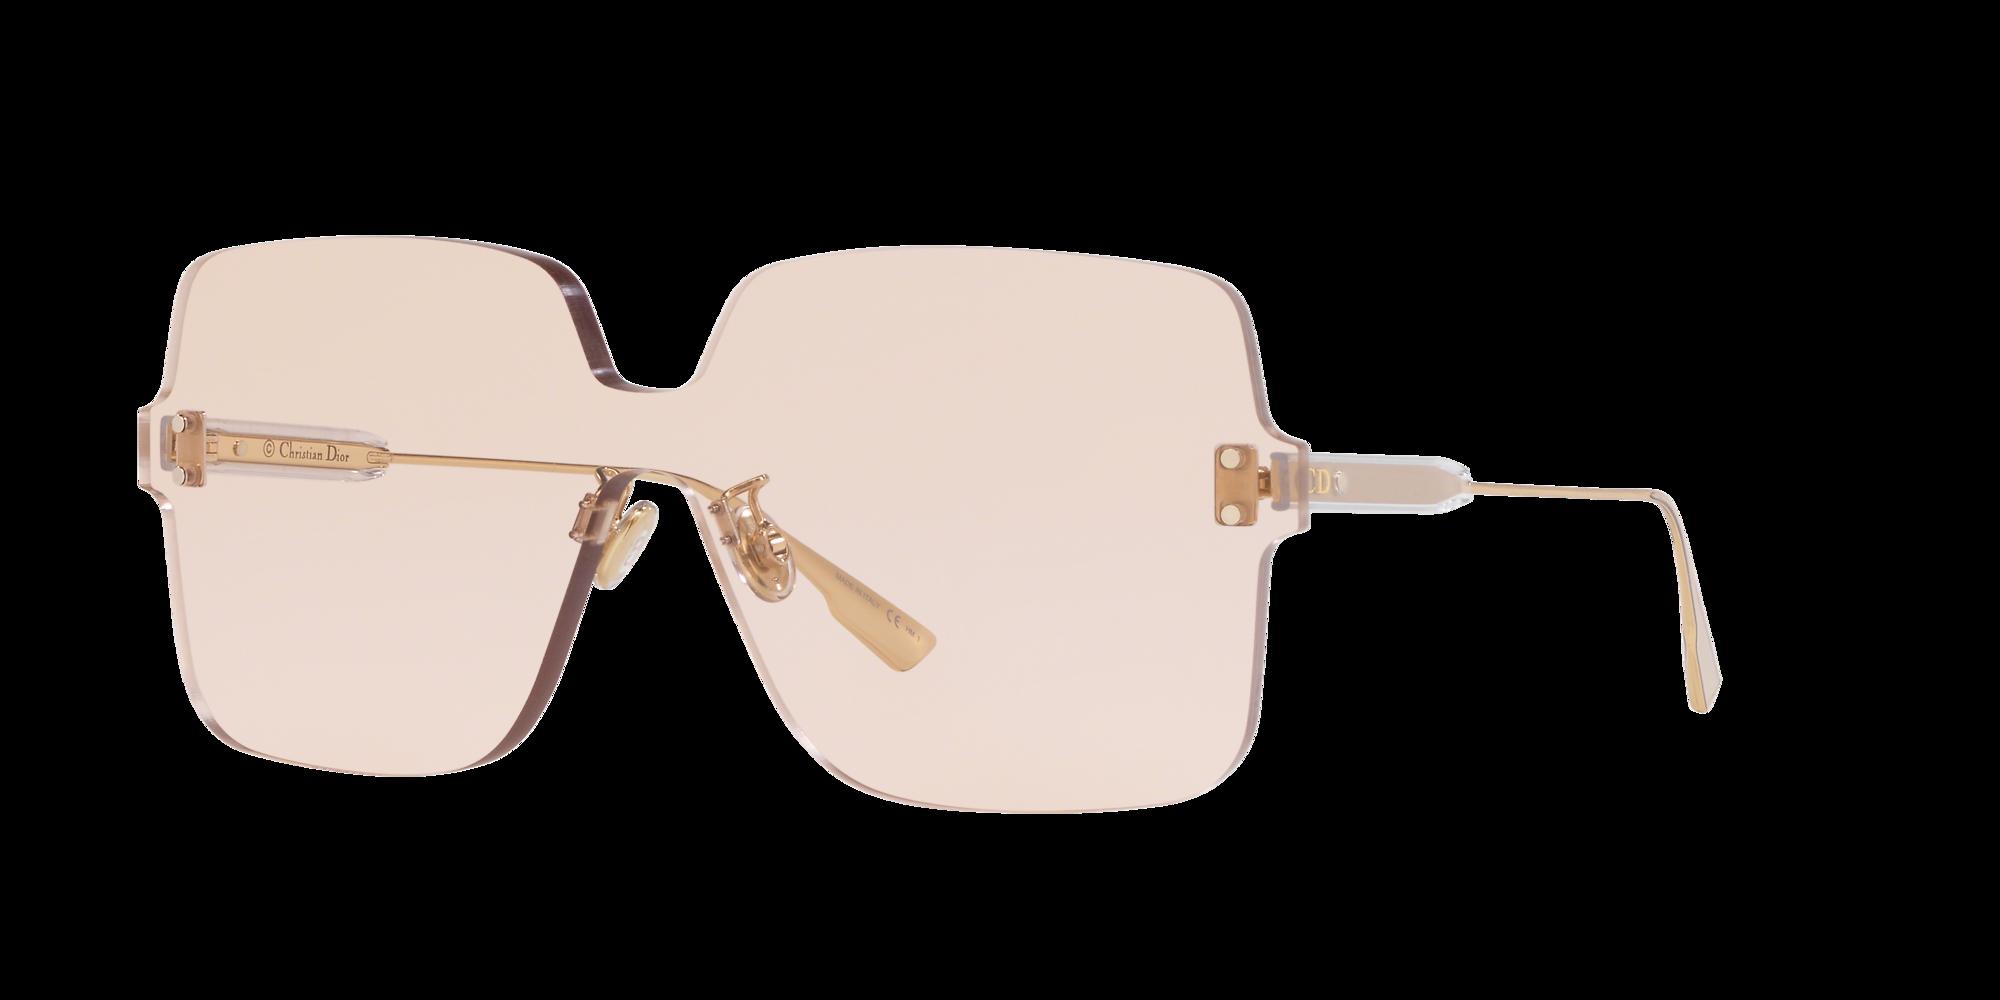 Dior Mann  DIORCOLORQUAKE1 -  Frame color: Pink, Lens color: Pink